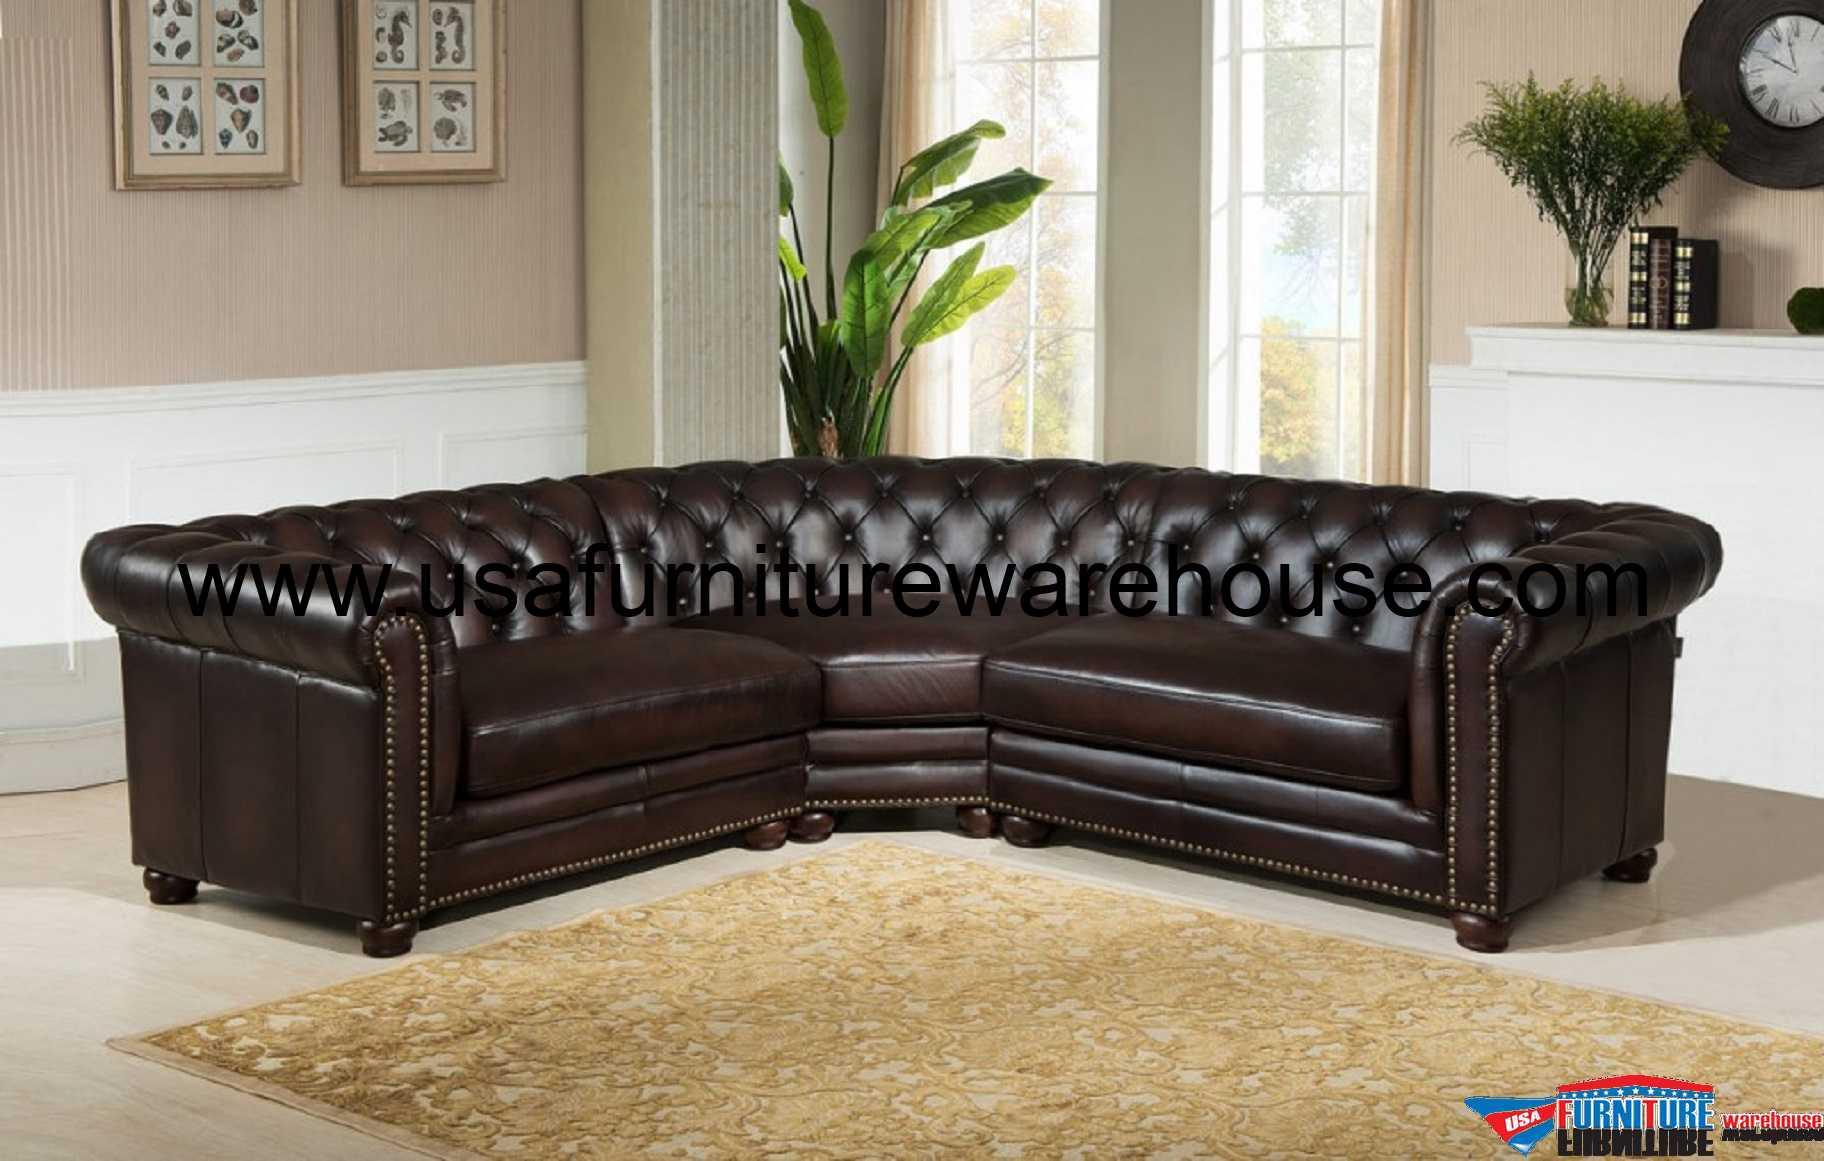 100 genuine leather sofa sectional black 3 piece kennedy dark brown